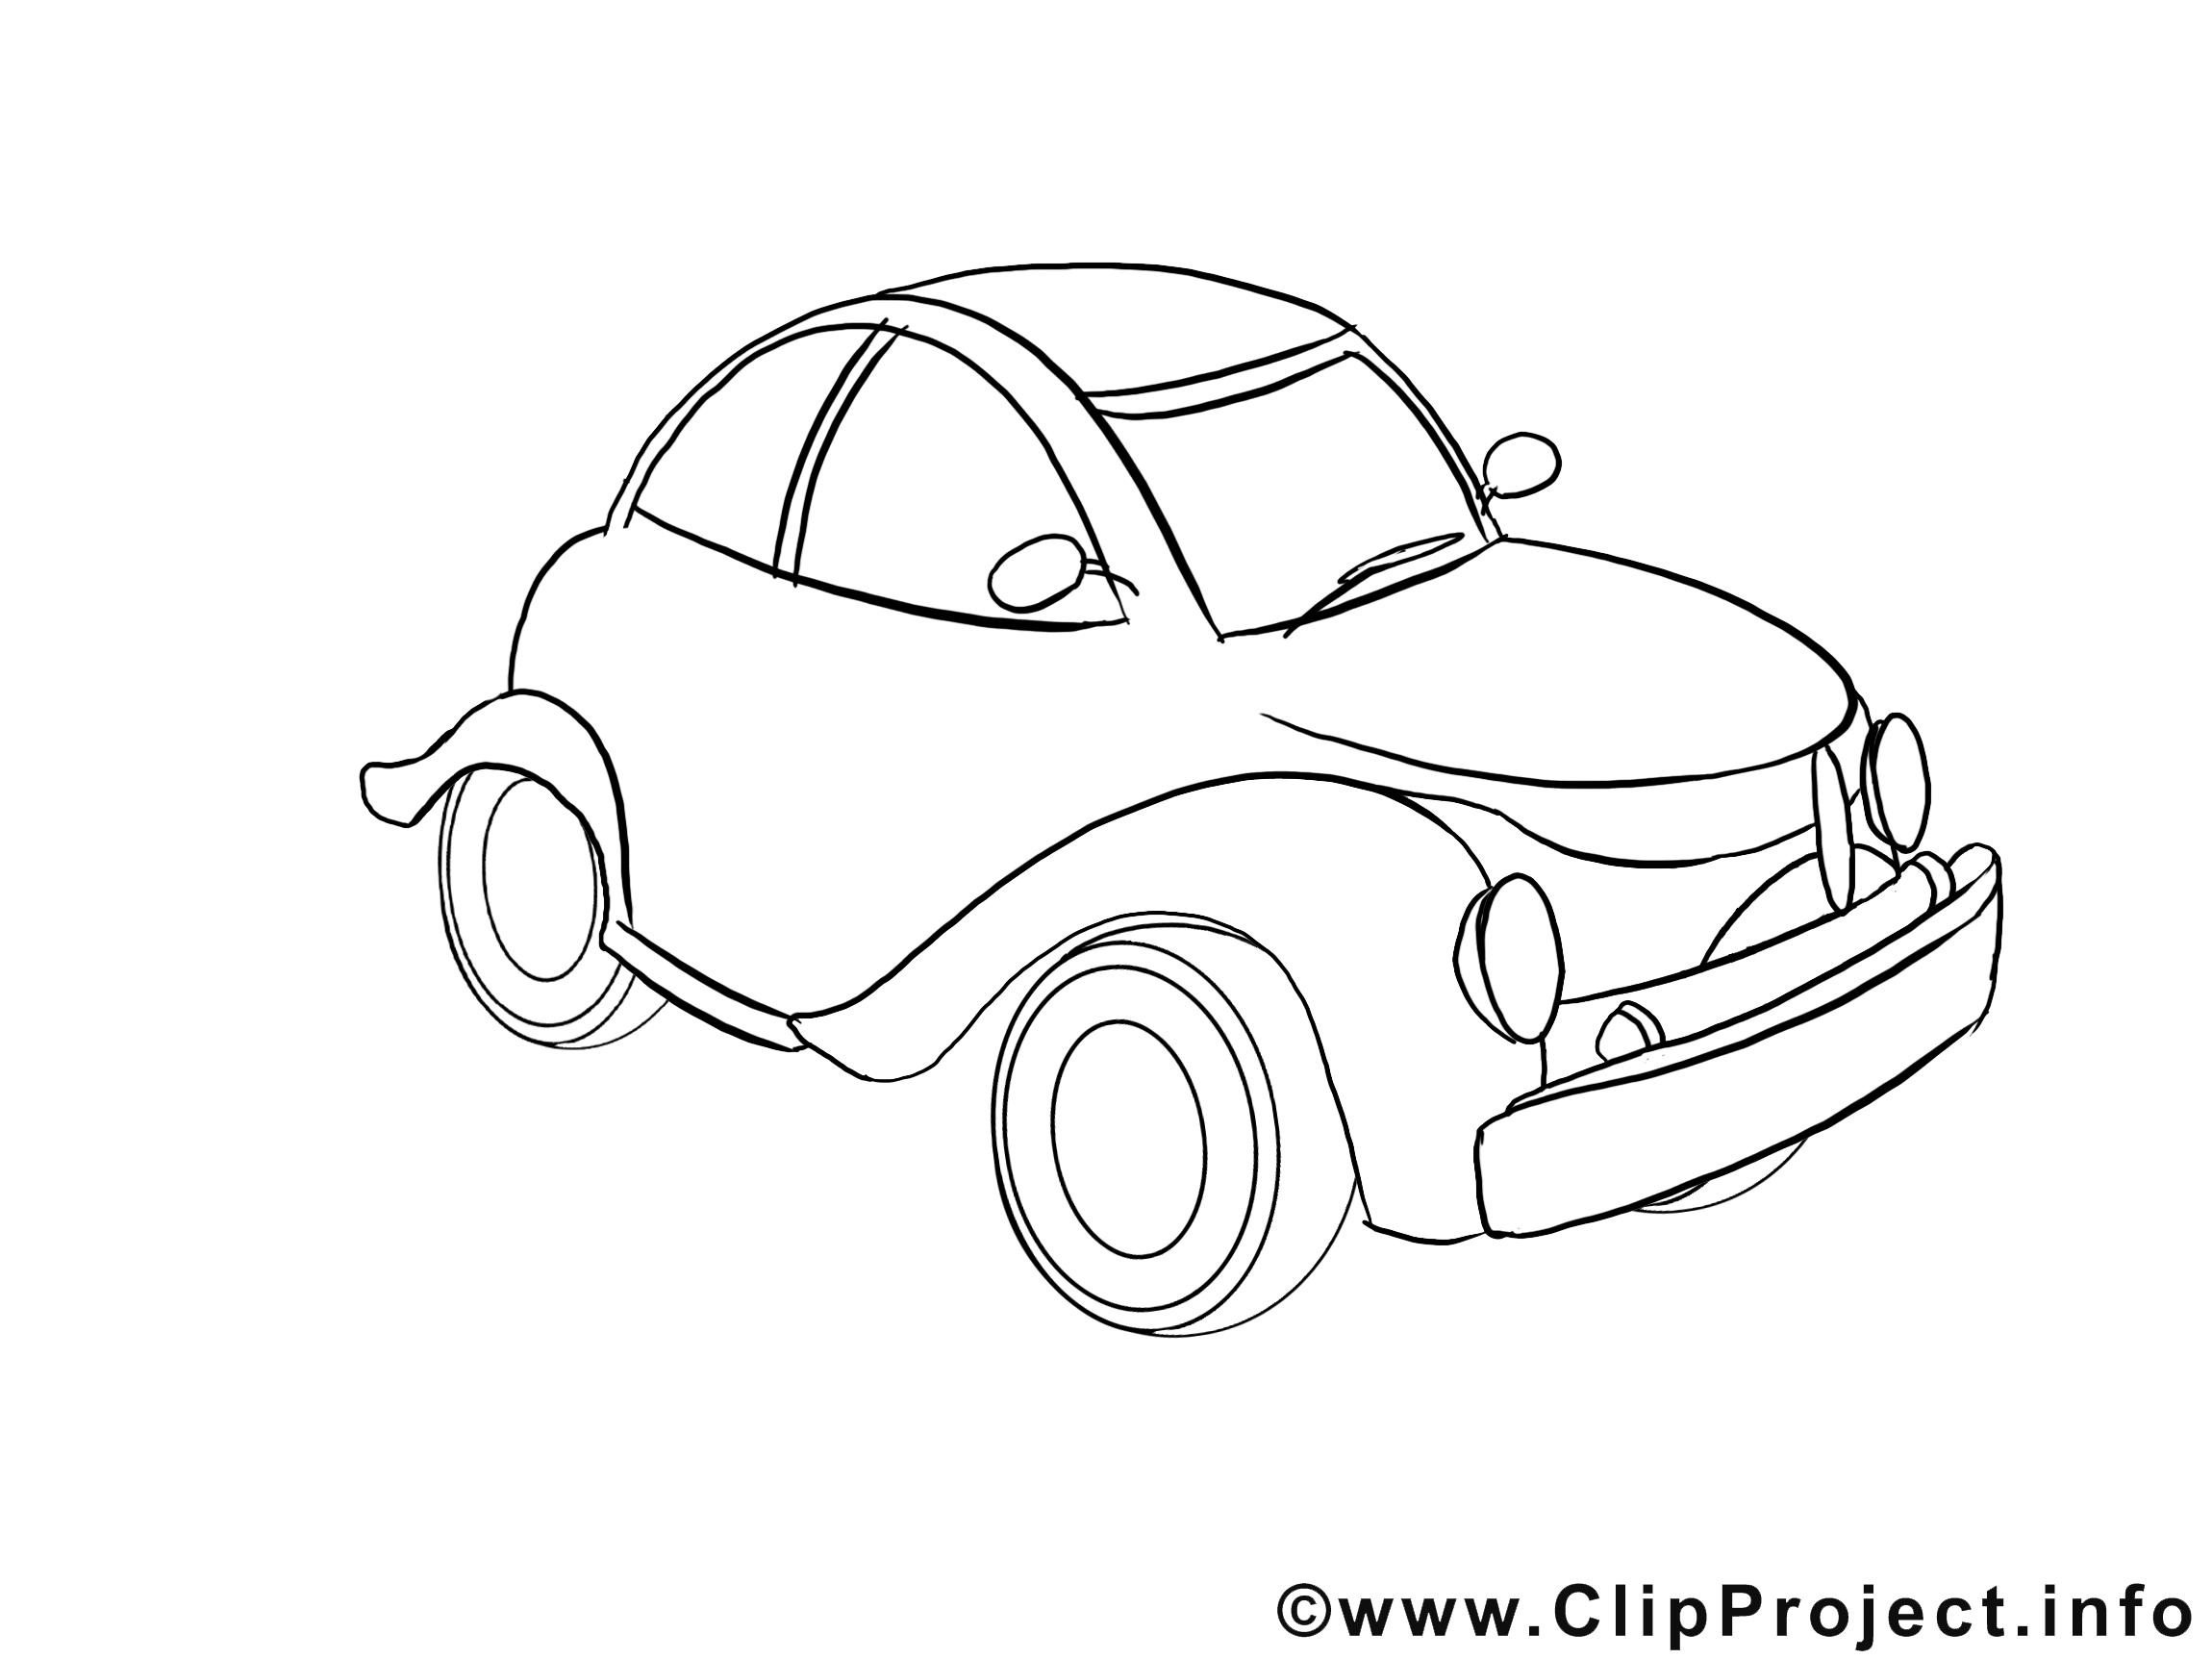 Cars Auto Malvorlage